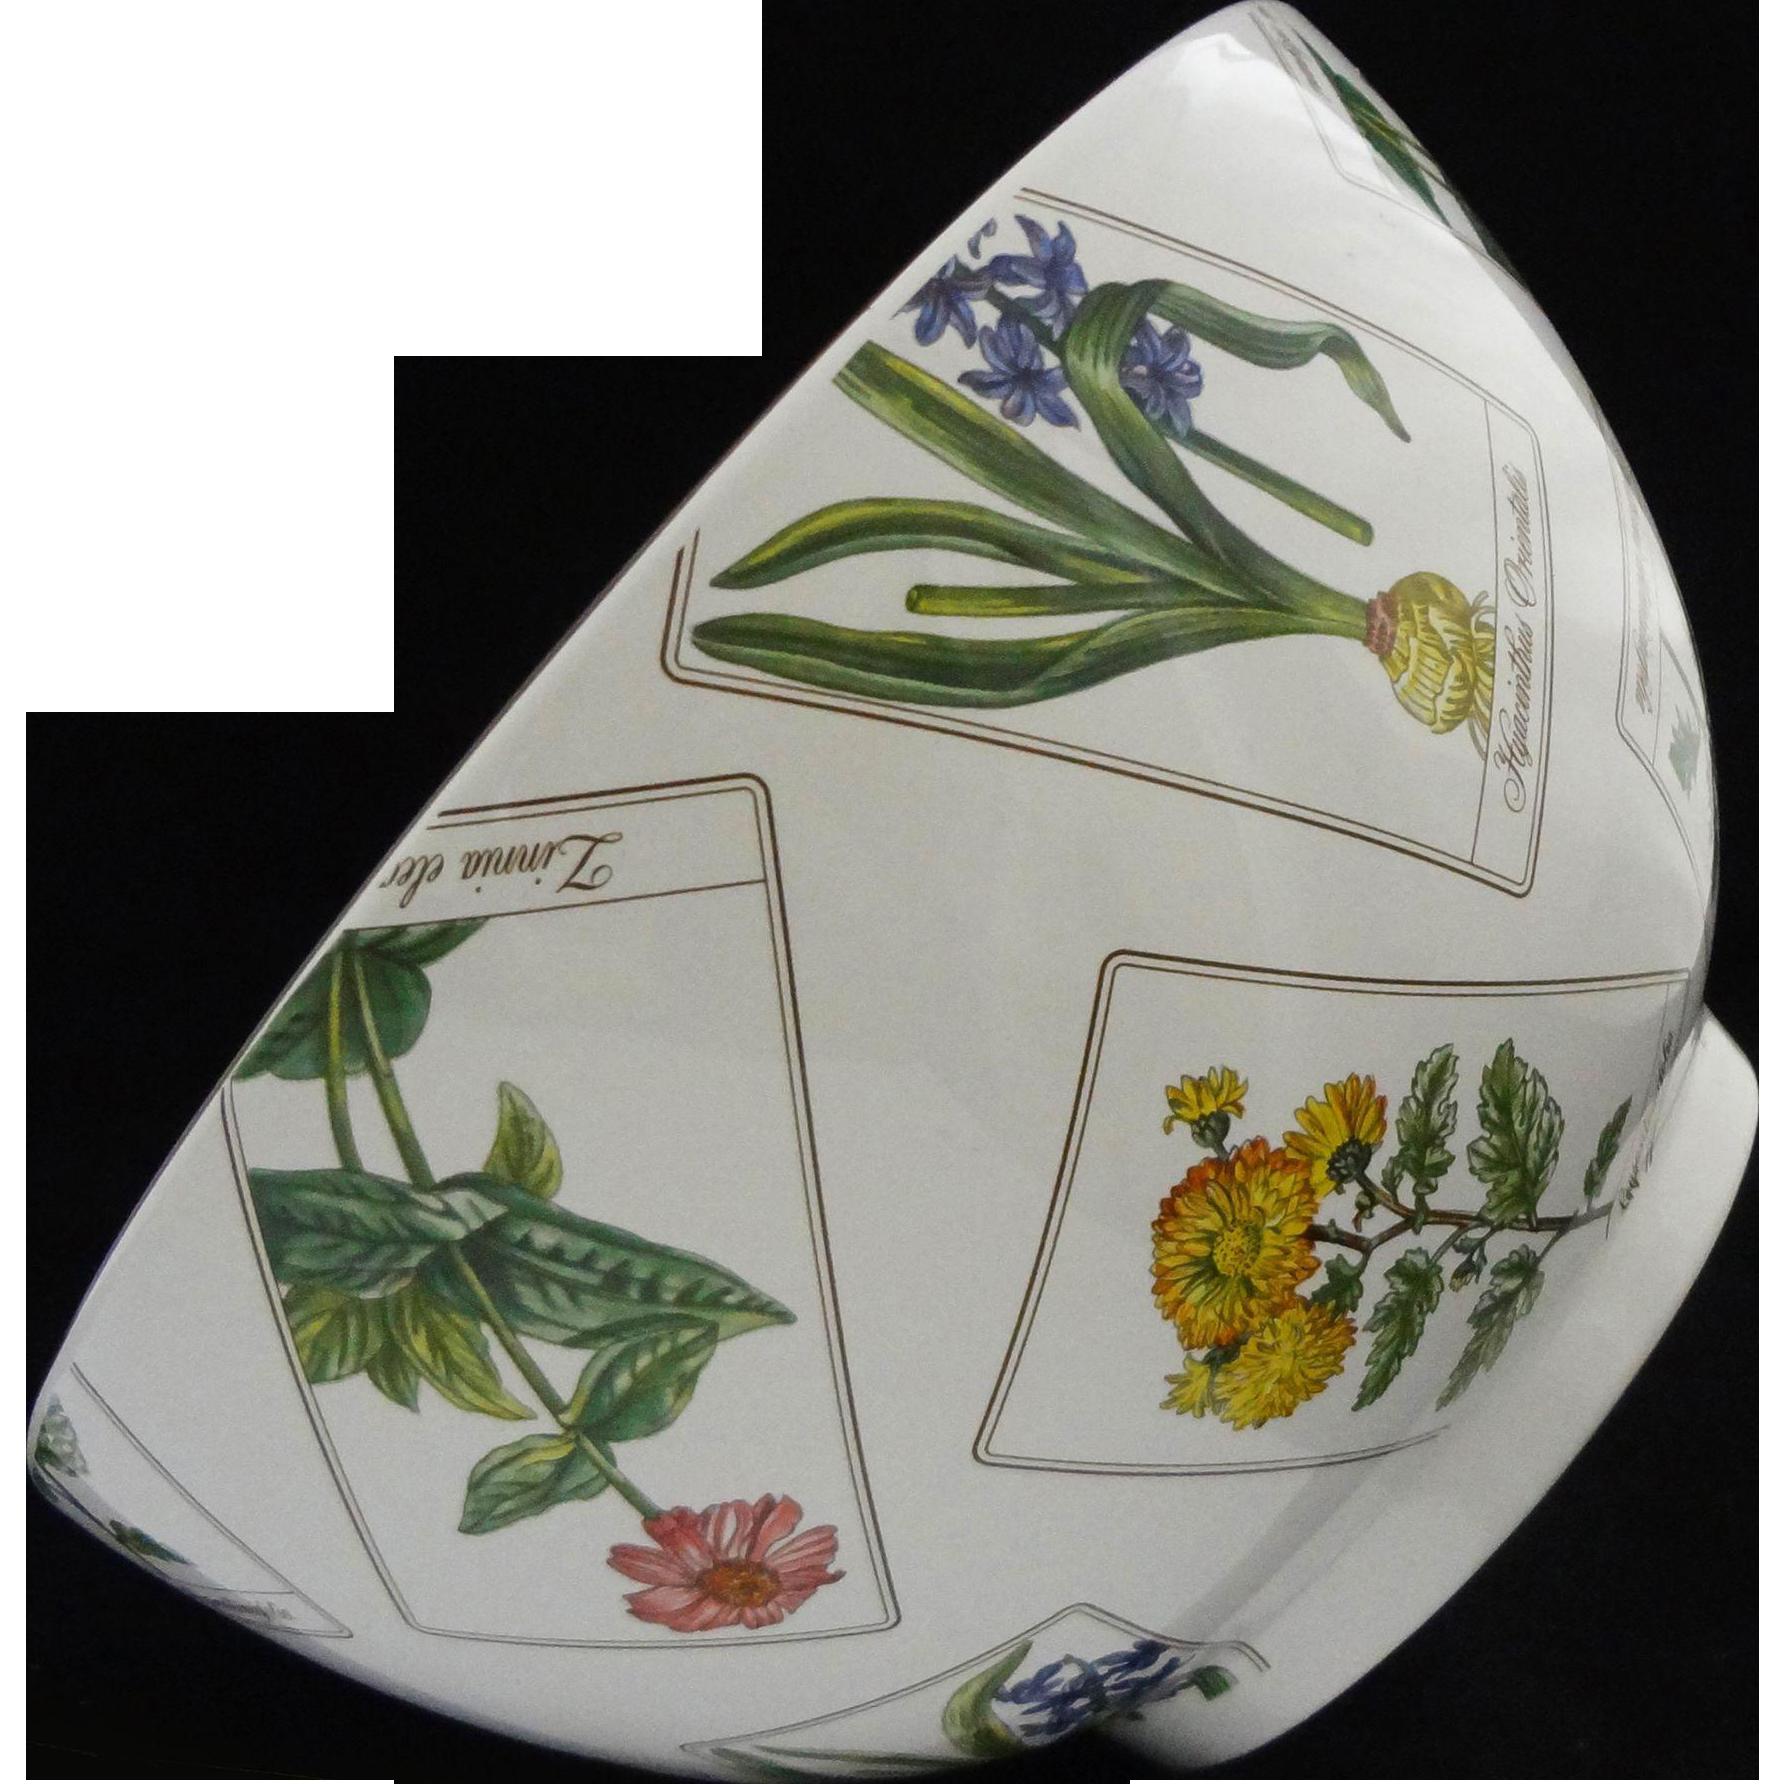 Tiffany & Co. Large Porcelain Serving Bowl Botanicals - 20th Century, Portugal